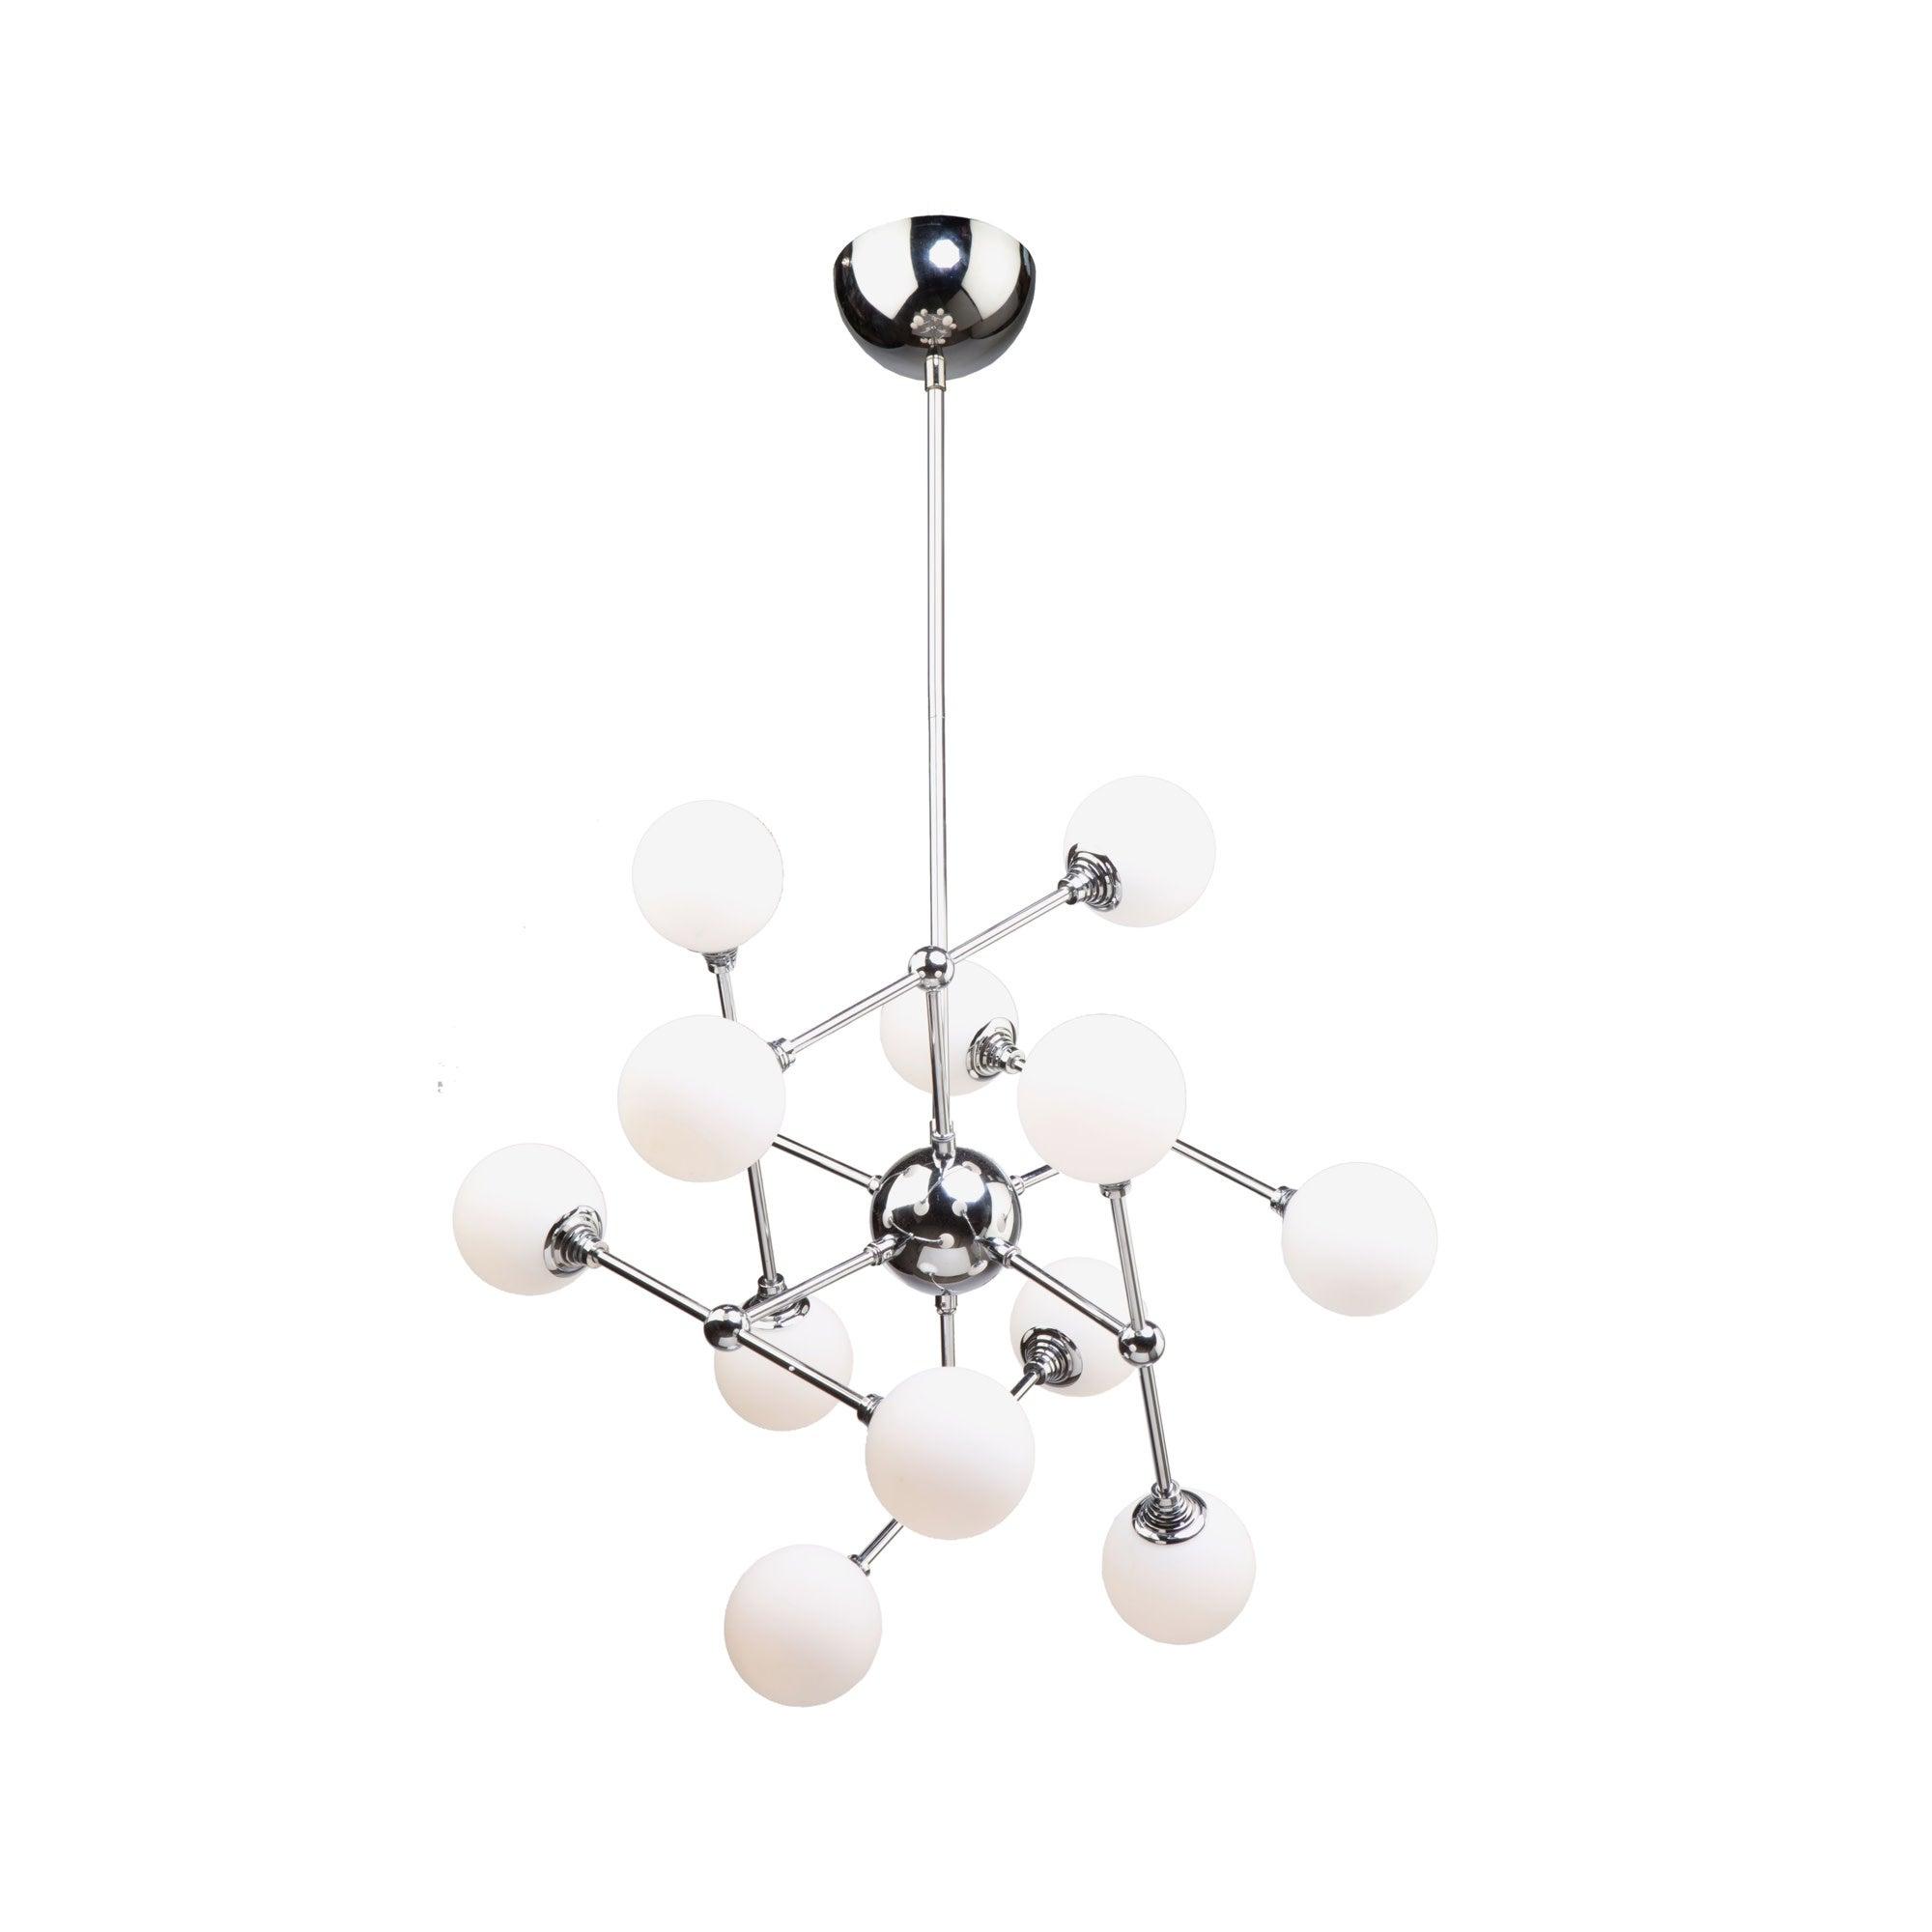 "Favorite Asher 12 Light Sputnik Chandeliers With Artcraft Lighting Ac7562 Luna 12 Light 26"" Wide 3000K Led Abstract Sputnik  Chandelier – (View 14 of 25)"